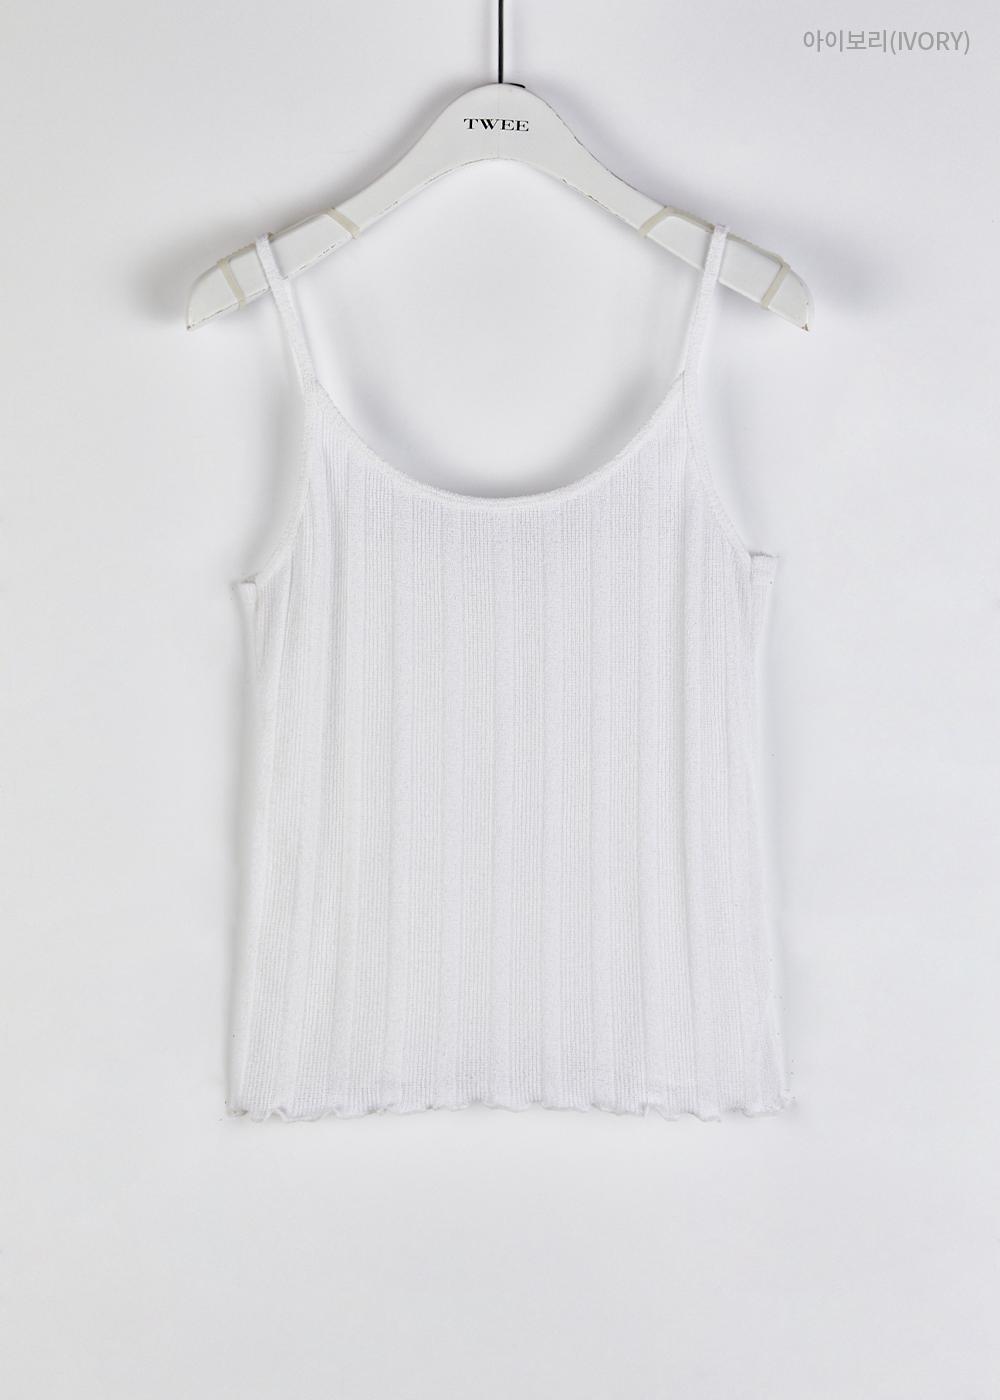 Lumming Knitwear Strap Sleeveless